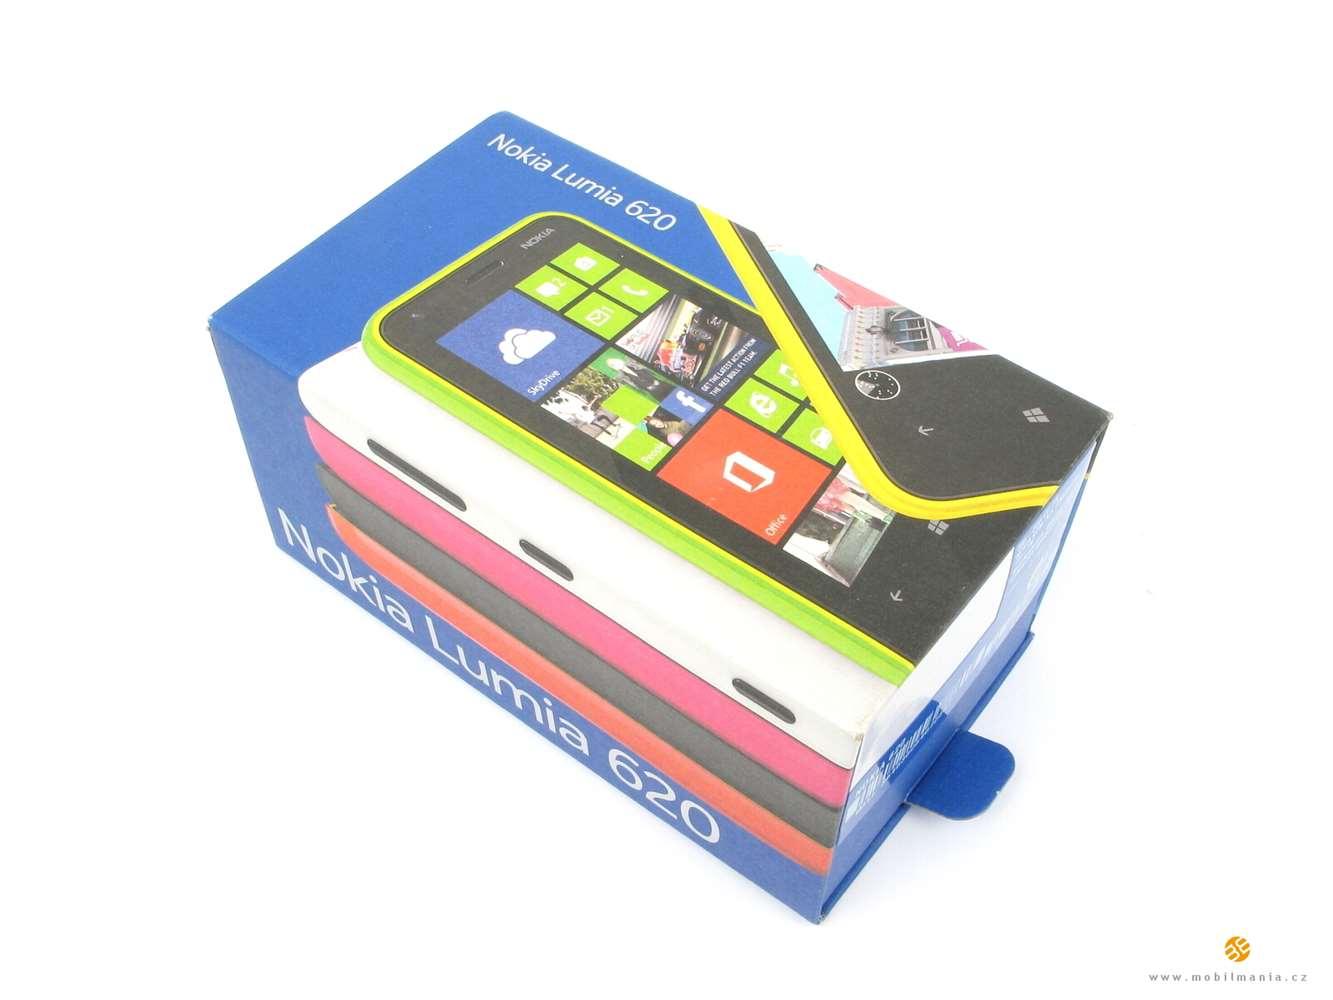 Galerie Nokia Lumia 620 Ideln Vstup Do Svta Oken Recenze Magenta Foto 4